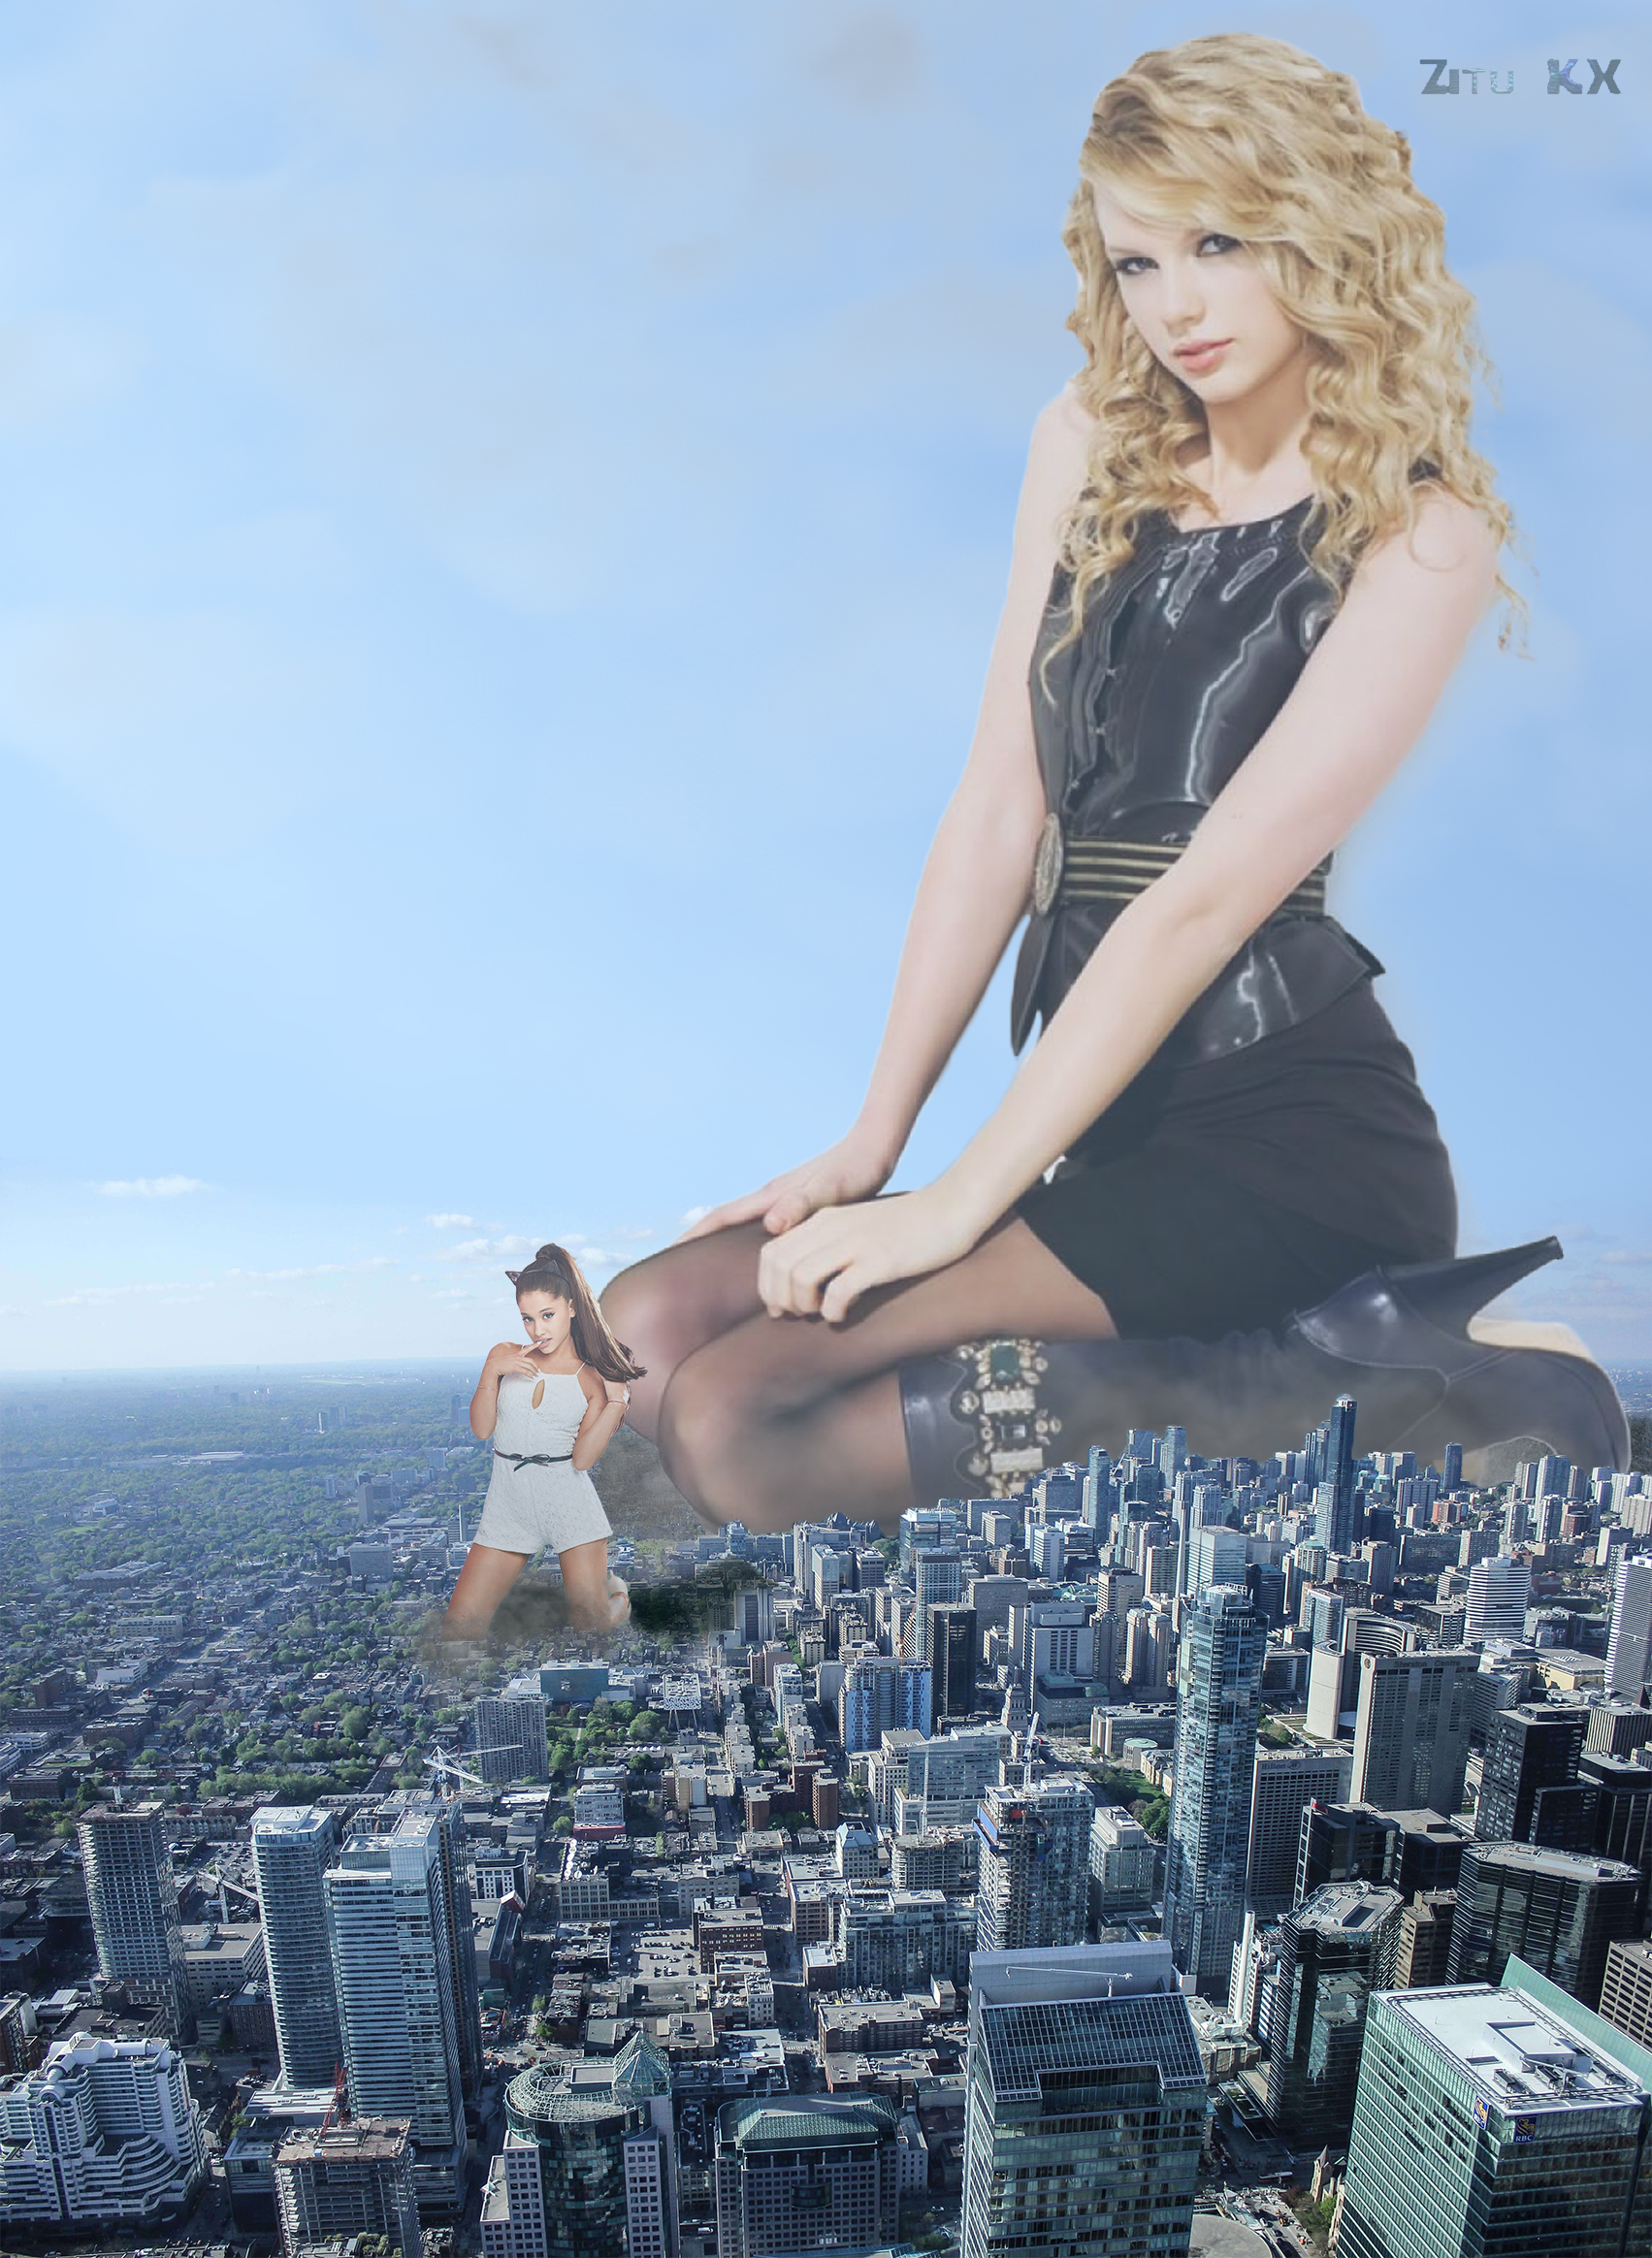 Taylor Swift - Autumn Set 2/7 by ZituKX